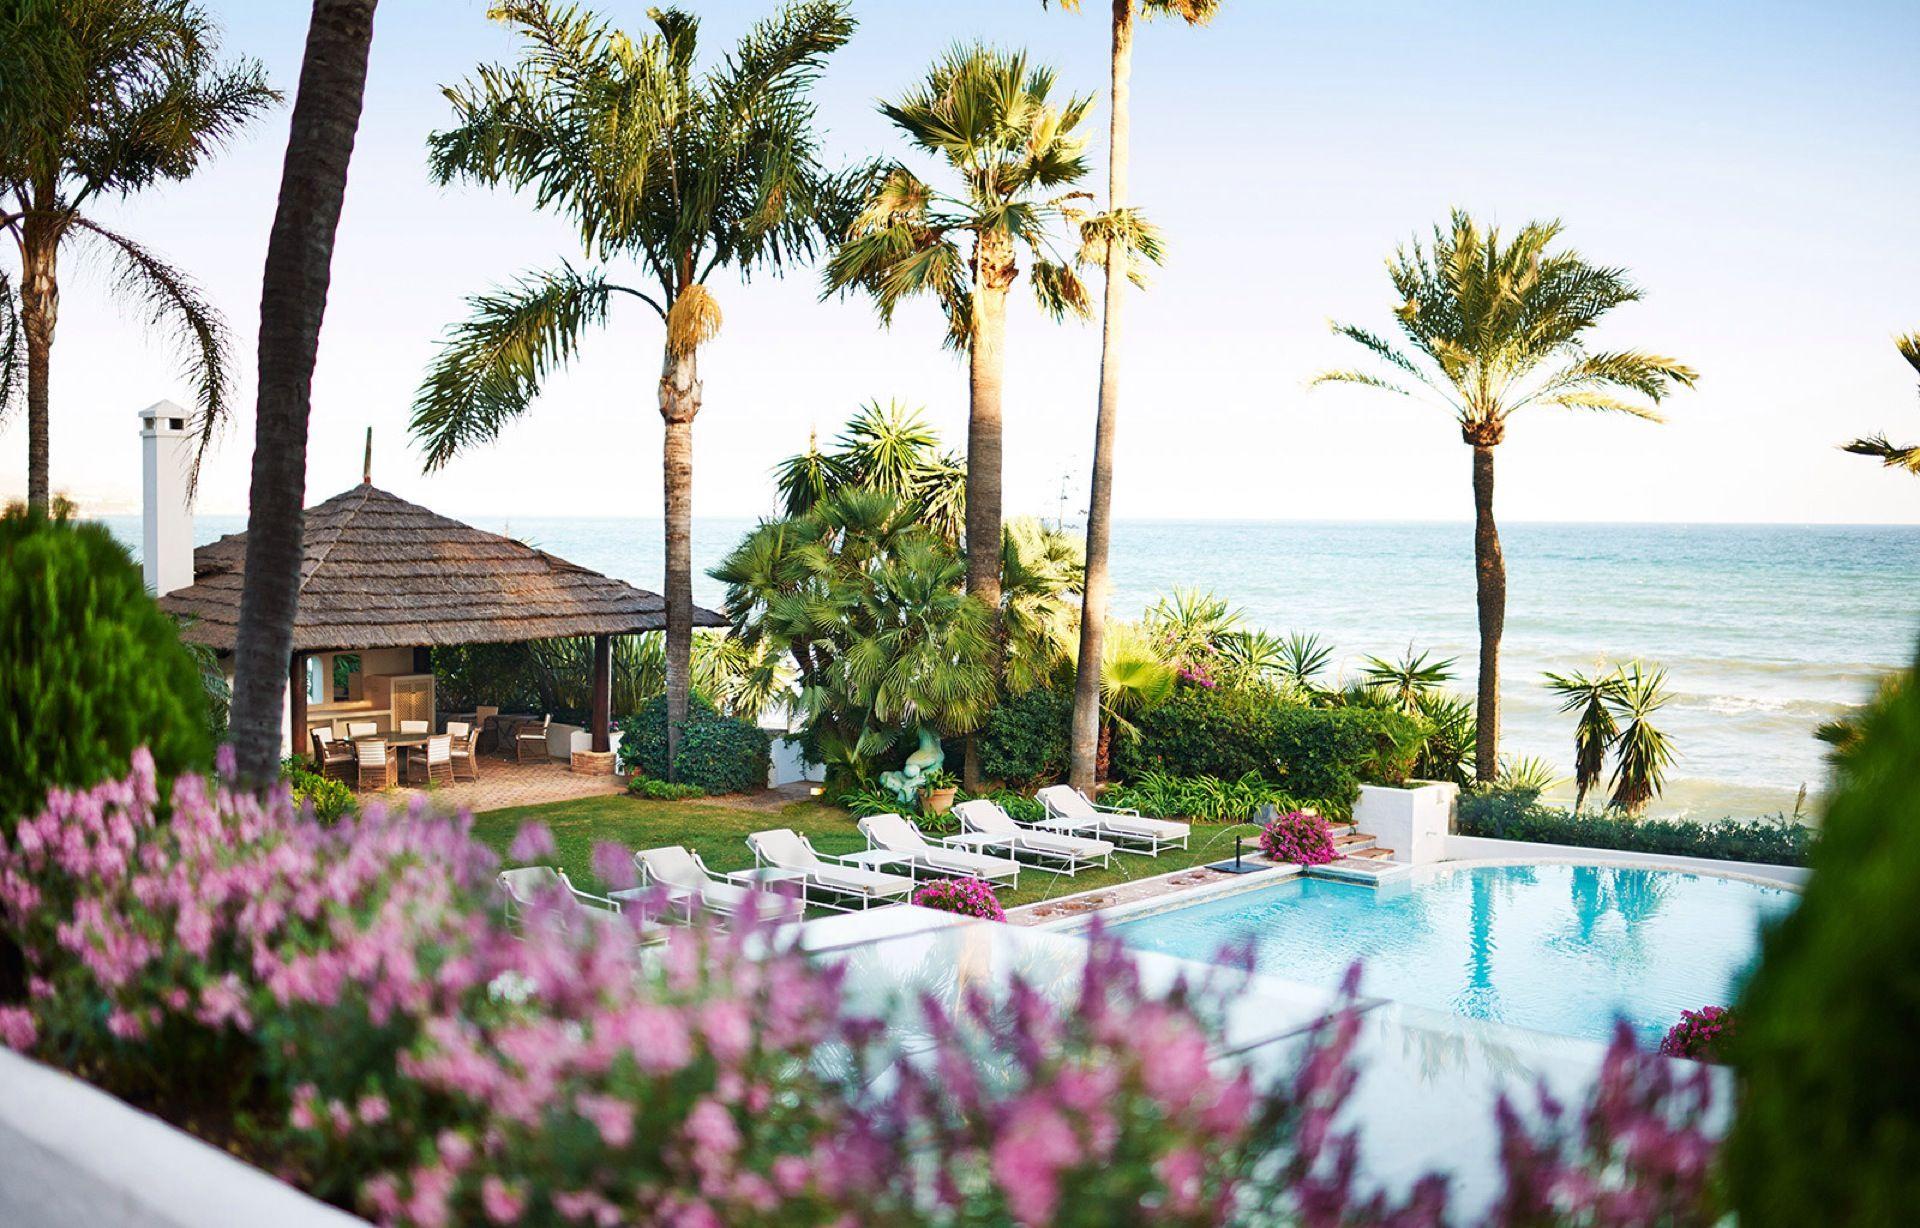 Marbella Club Hotel In Marbella Andaluc A Places I Ve Been  # Muebles Lola Mora Bahia Blanca